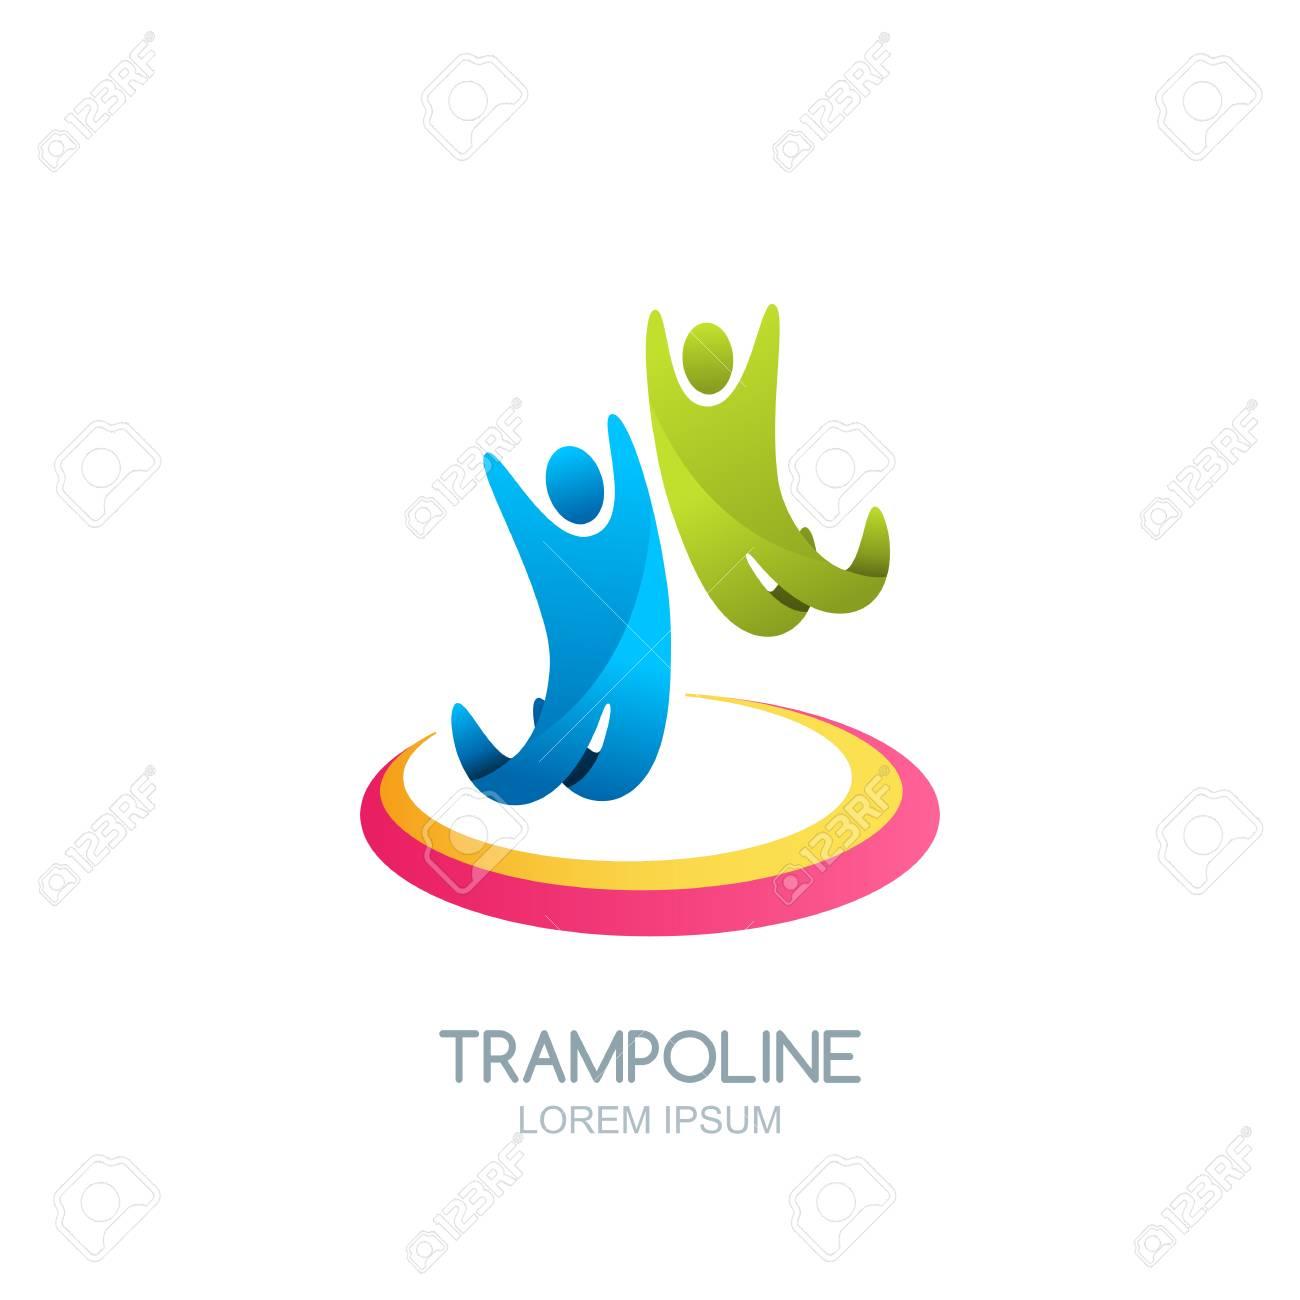 vector trampoline sport logo emblem design template isolated